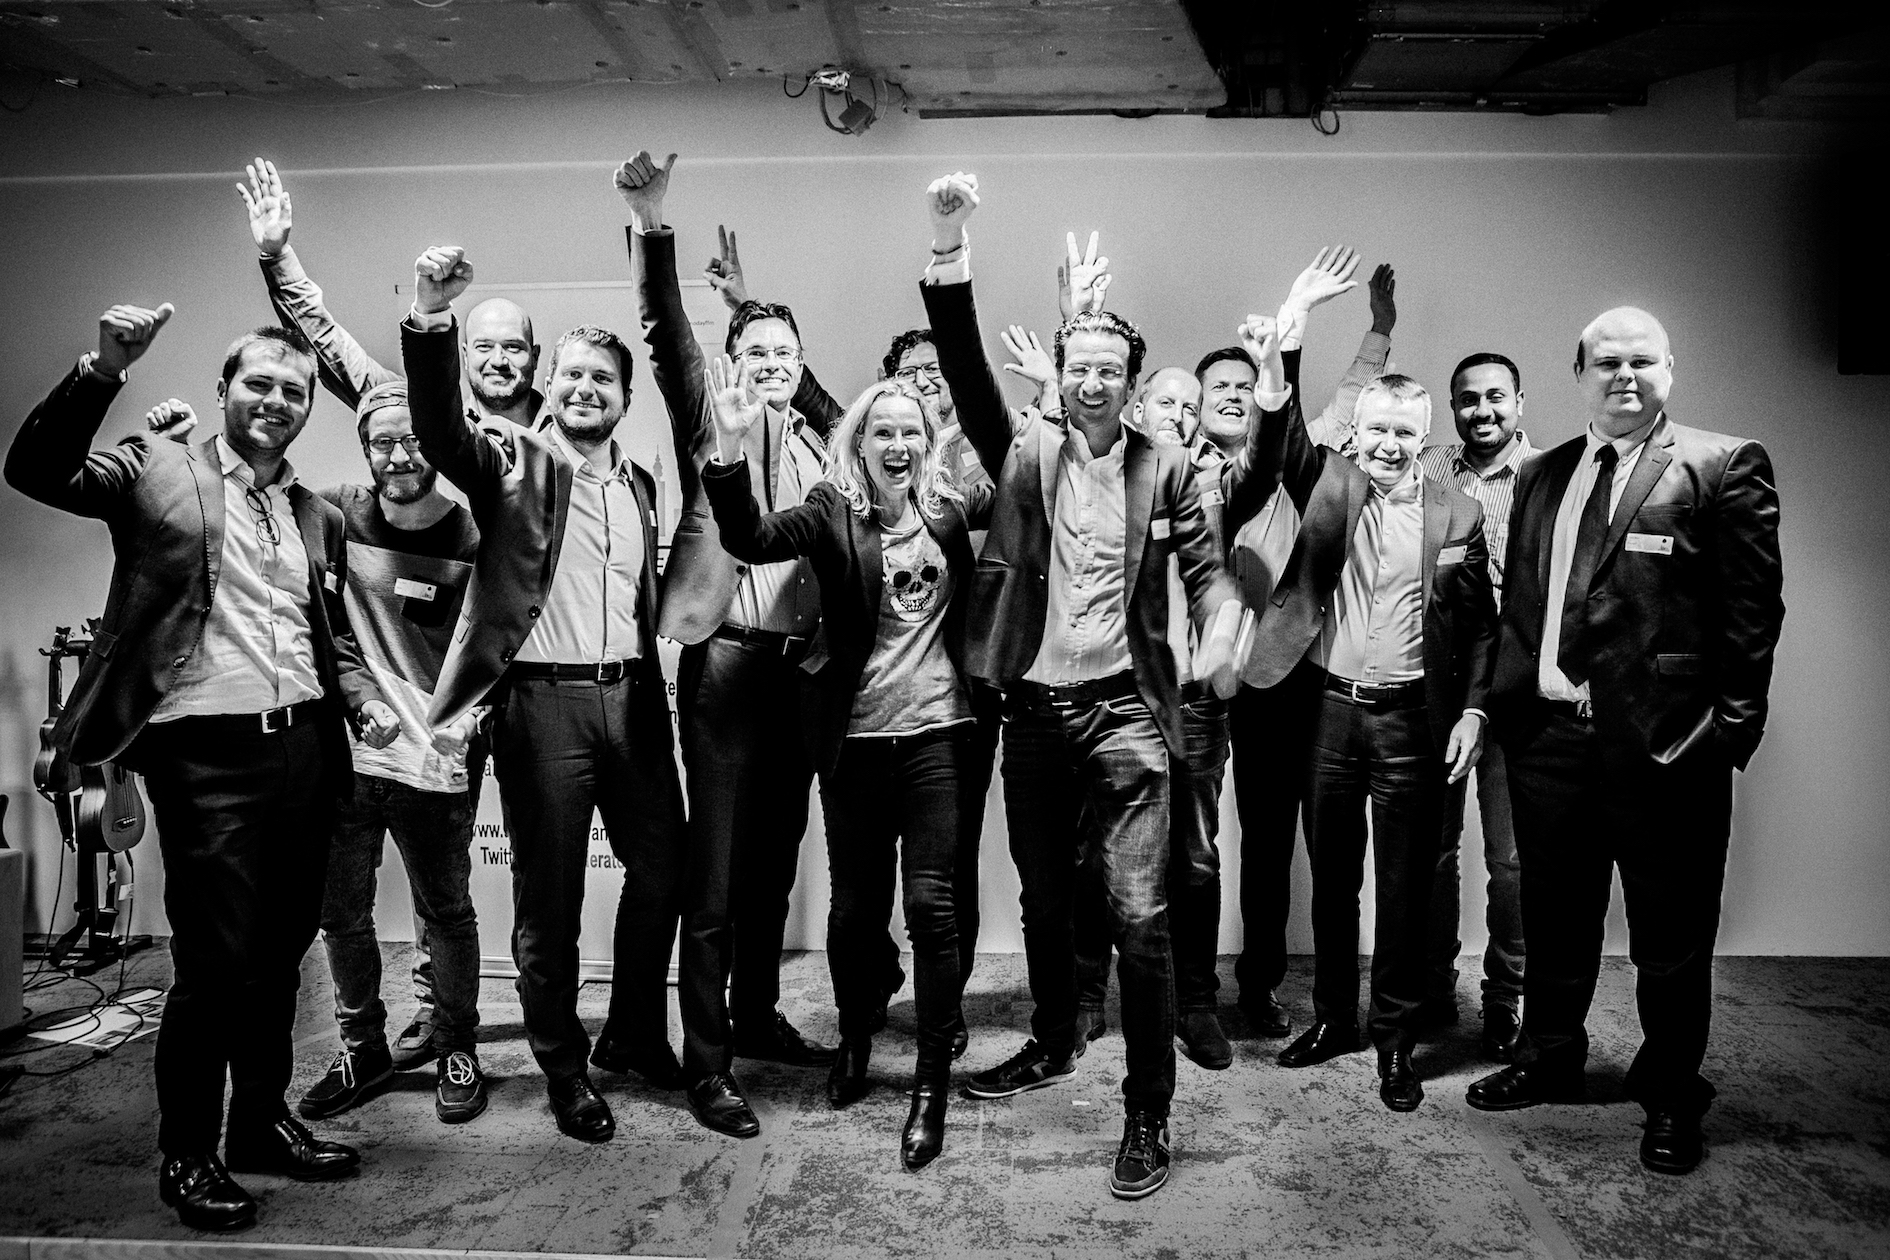 https://www.acceleratorfrankfurt.com/wp-content/uploads/2018/01/acc_1801_group_startups_3-2.jpg